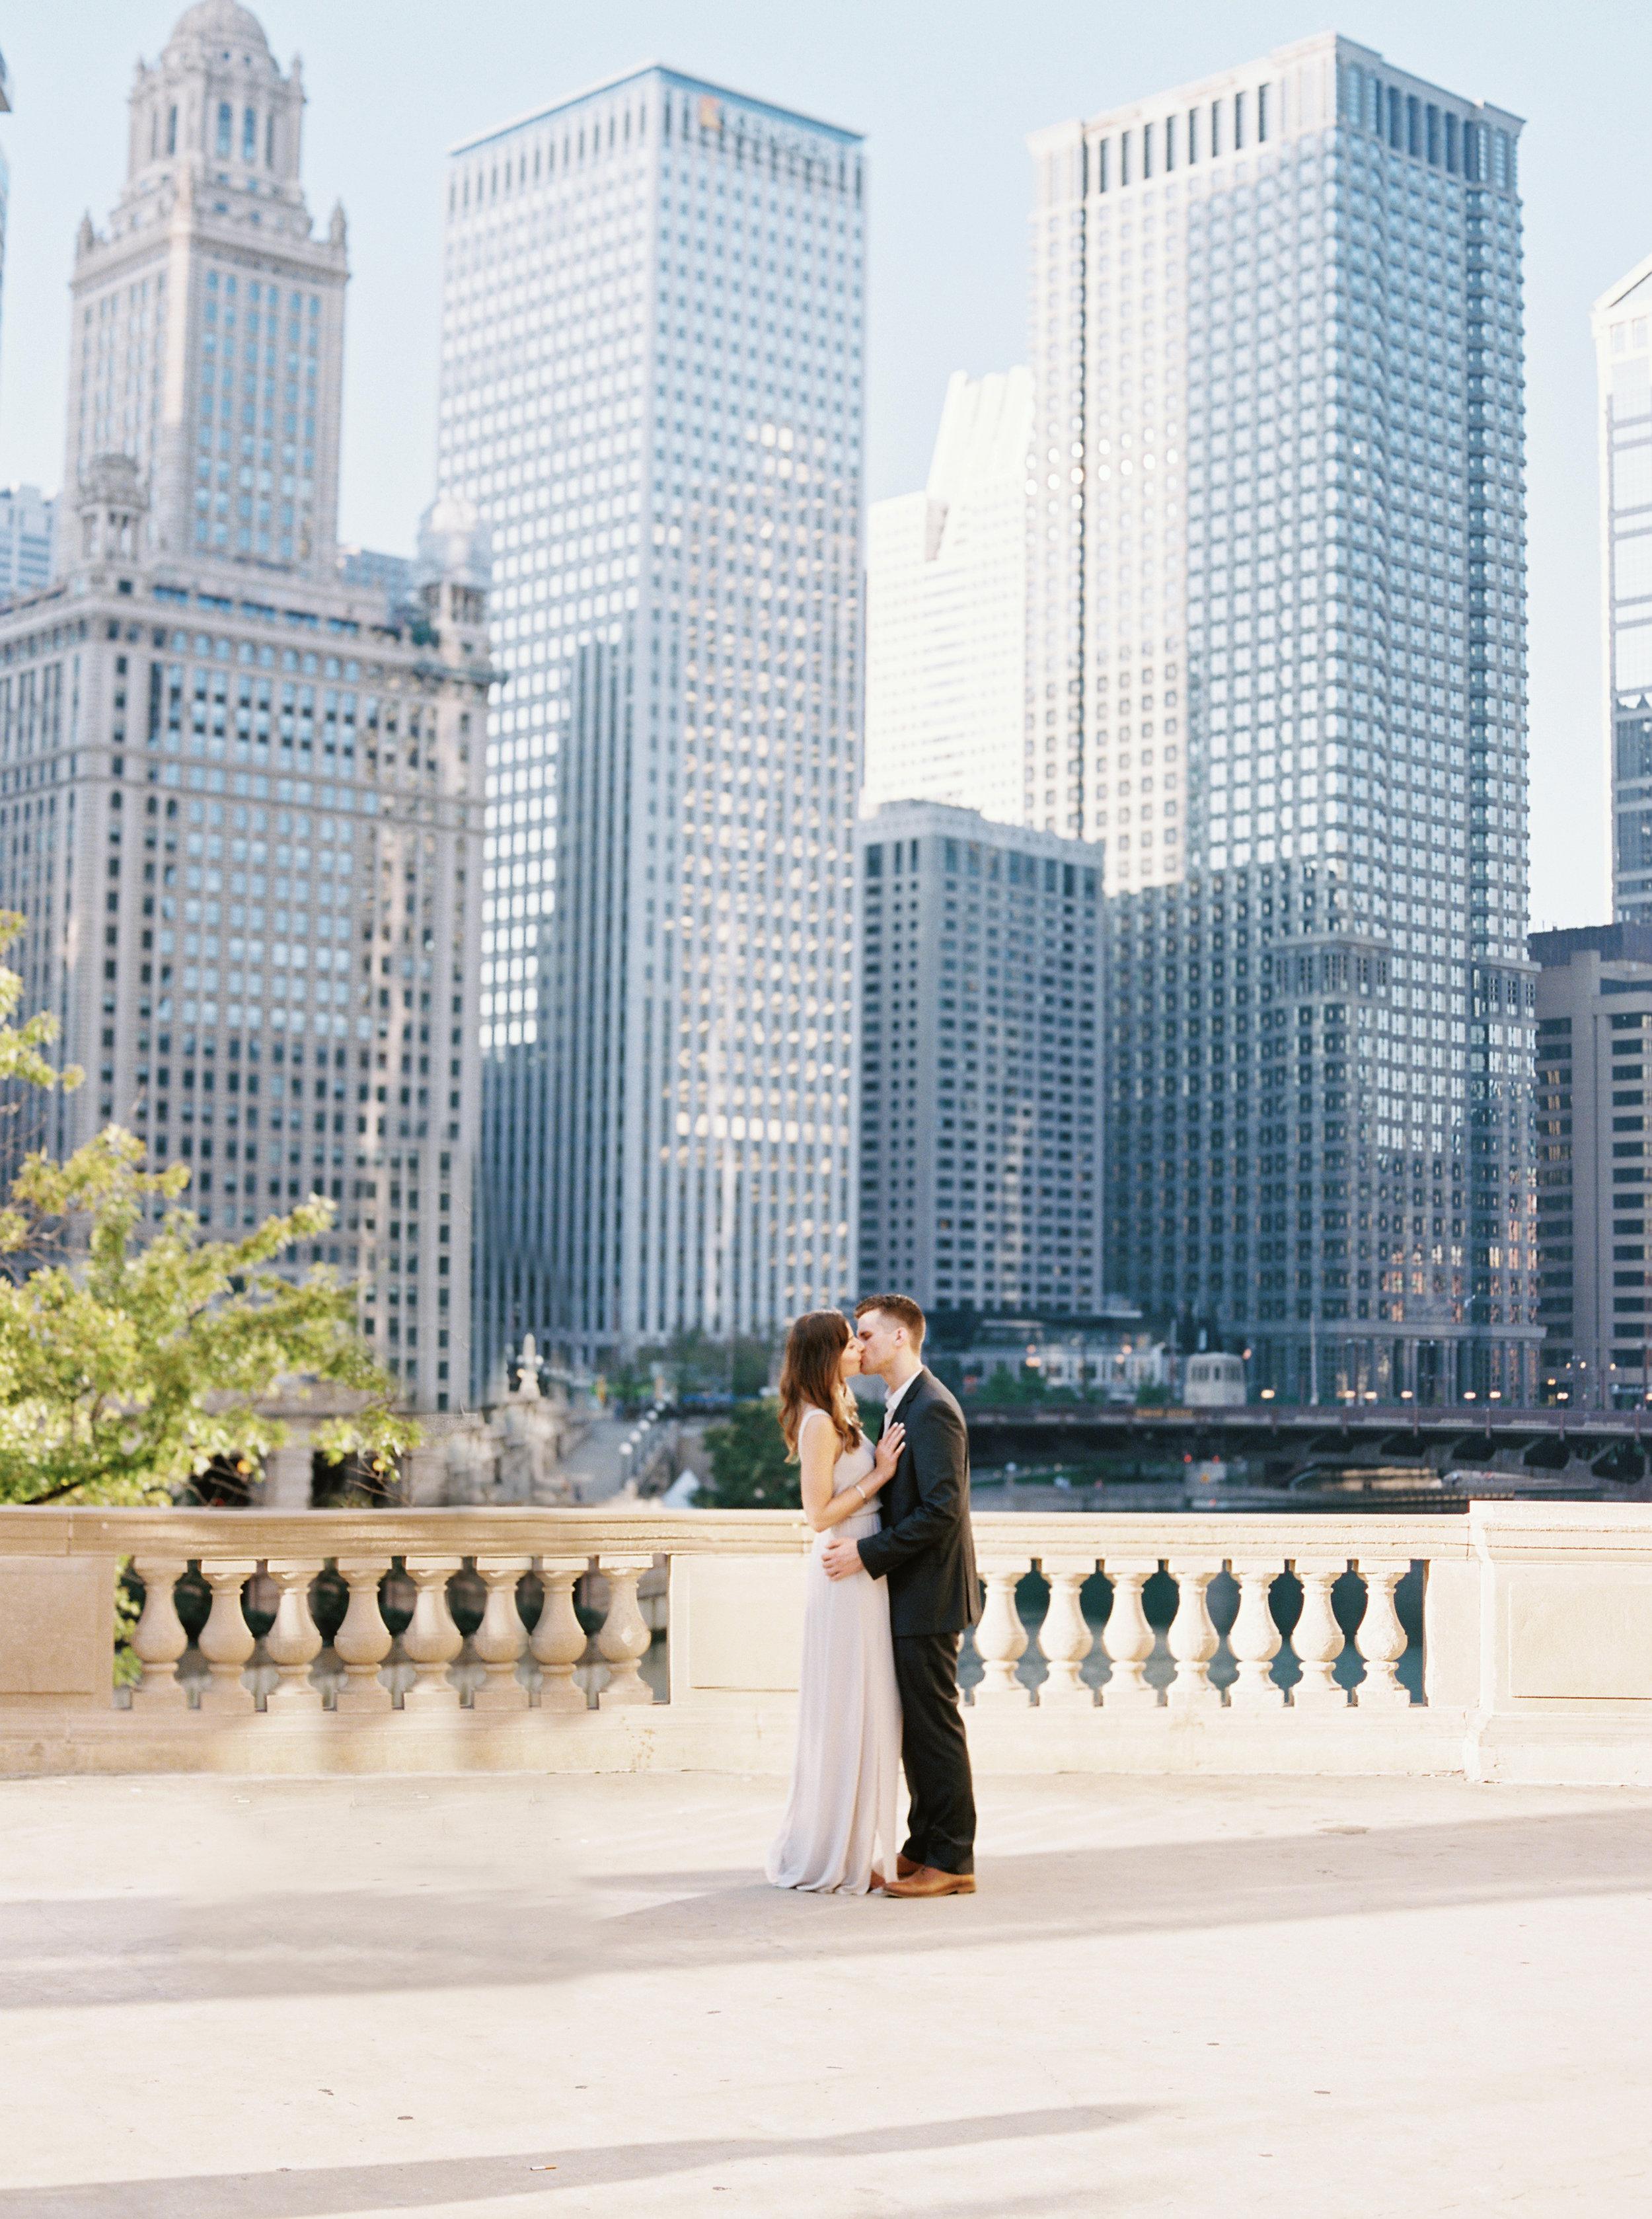 Kyle John l Fine Art Wedding Photography l Chicago, Copenhagen, California, New York, Destination l Blog l Nathalie and Colby_Lake Michigan_Sunrise Engagement_18